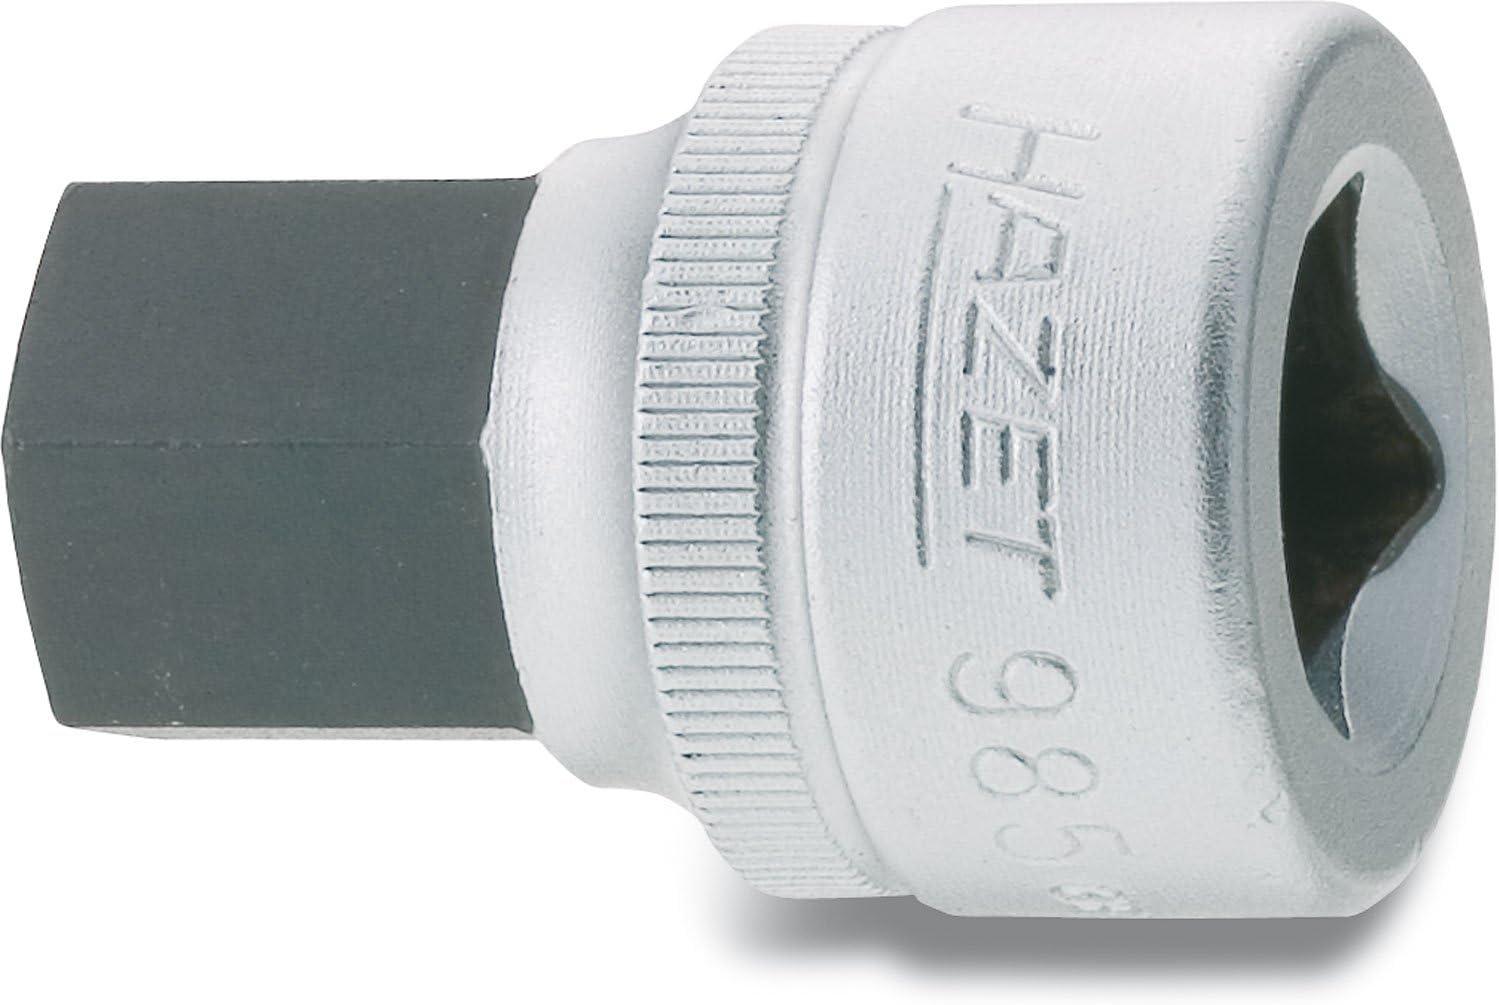 HAZET 985-19 Hexagon Profile Screwdriver Socket Multi-Colour